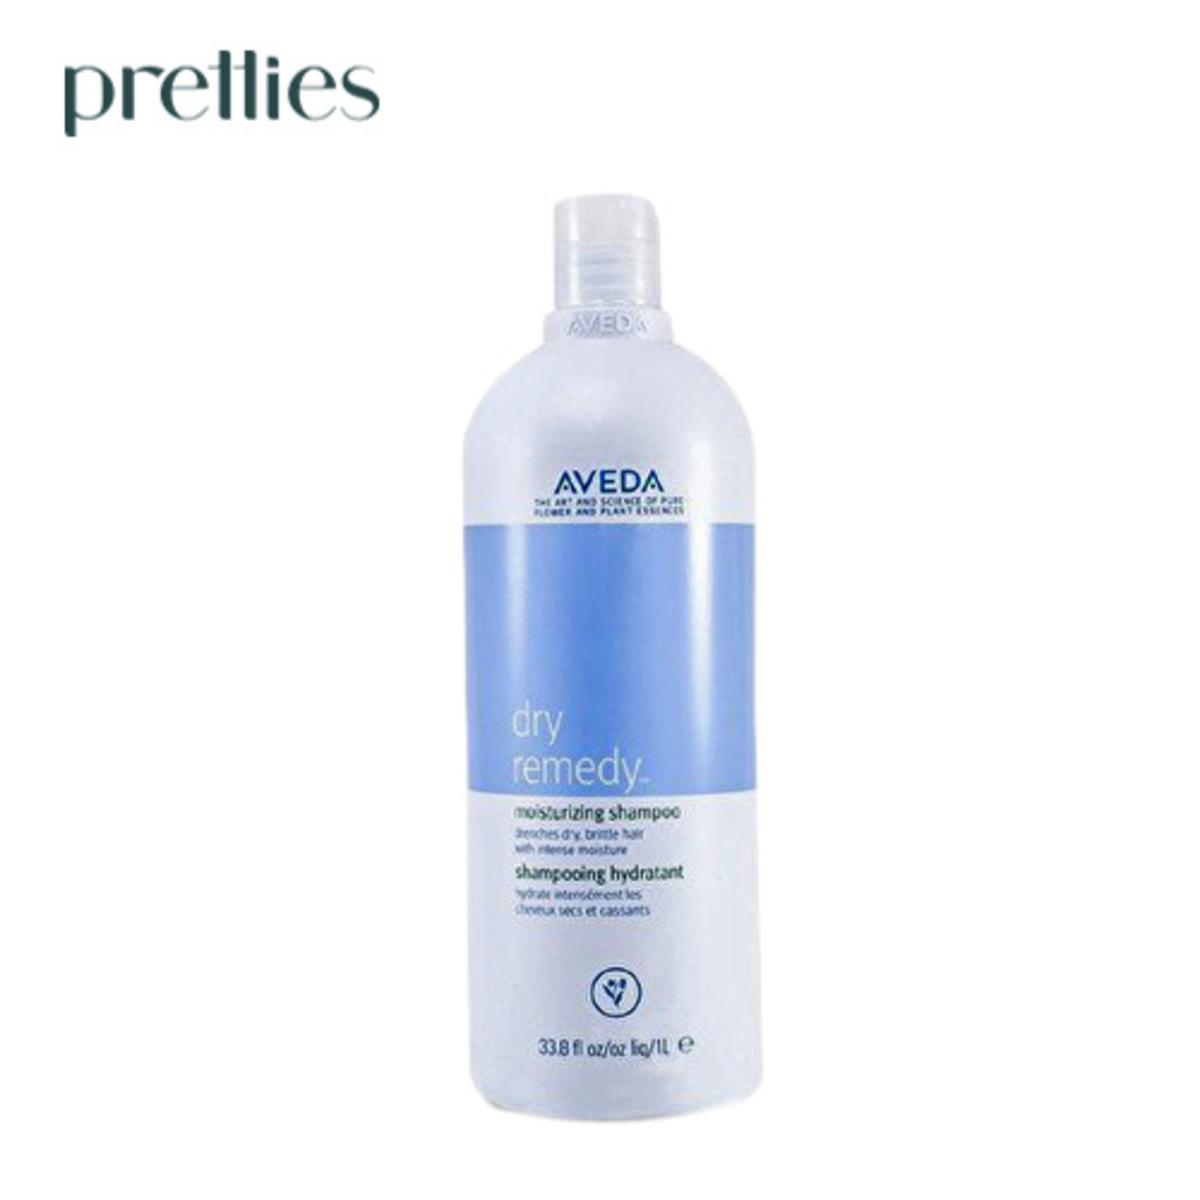 Dry Remedy Moisturizing Shampoo 1000ml (18084922439)